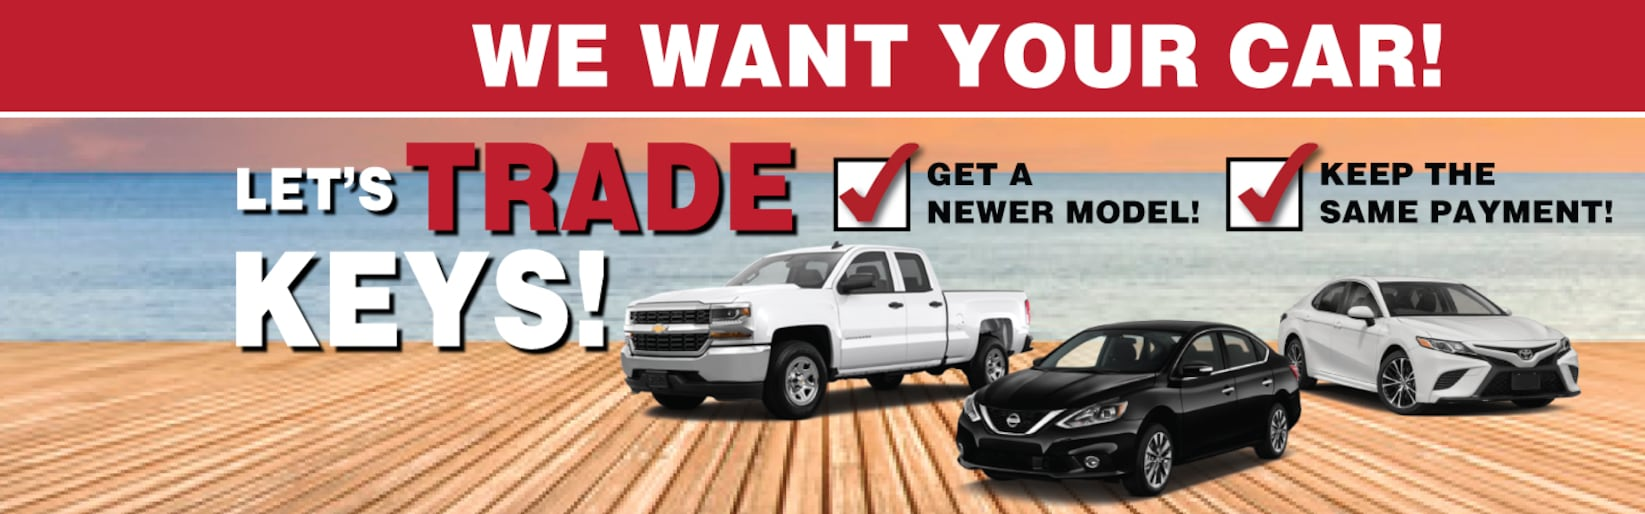 Bayside Auto Group   New Kia, Chevrolet, Toyota, Nissan dealership ...